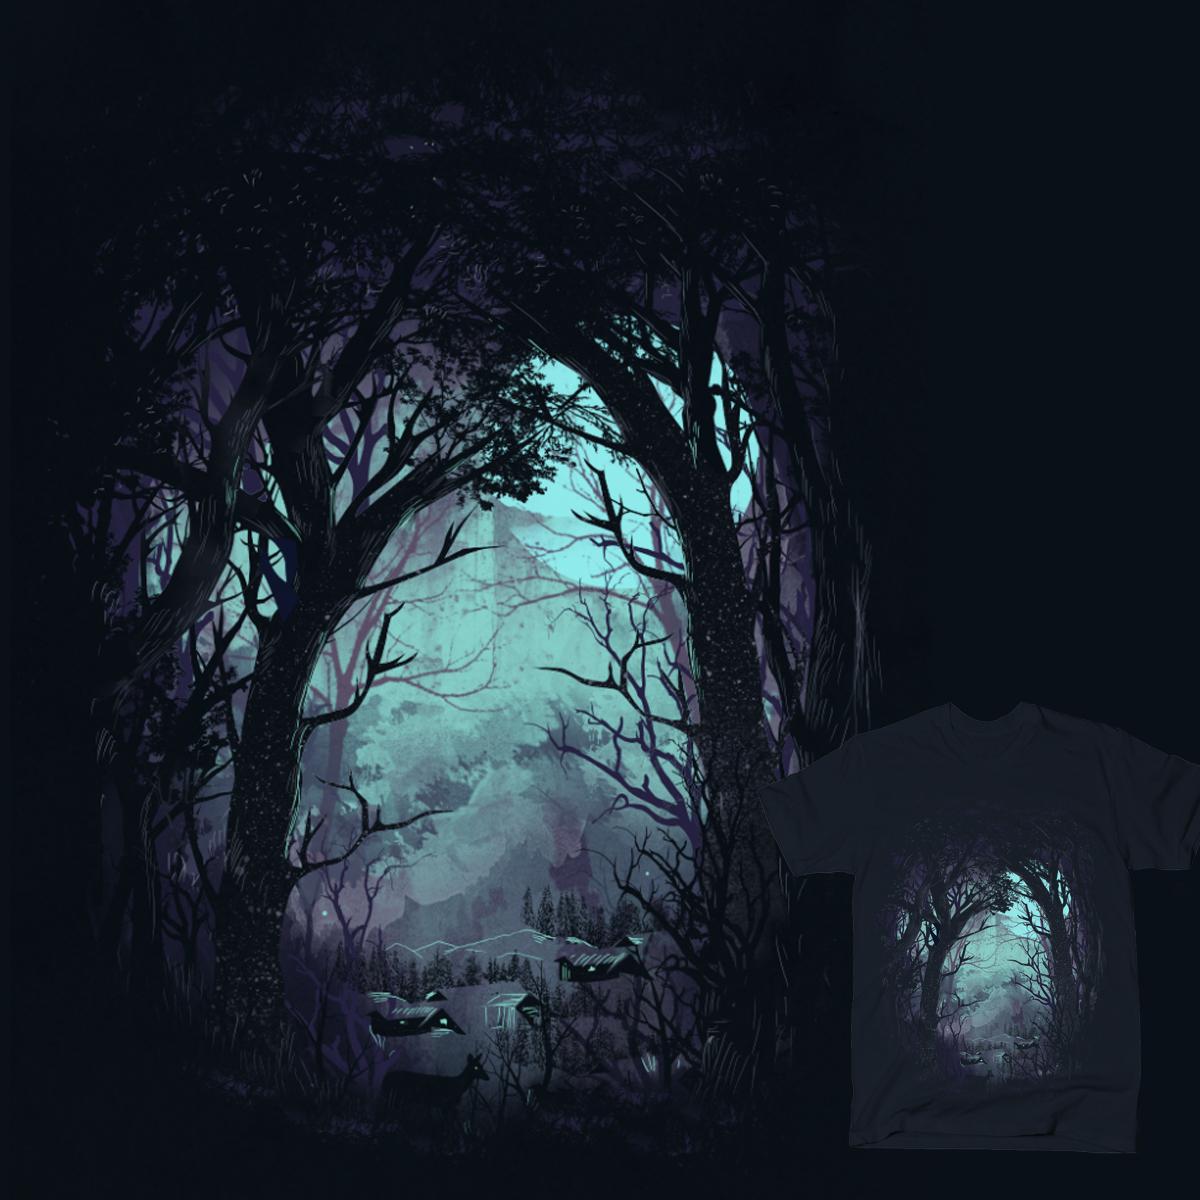 The Hiding Place by dandingeroz on Threadless